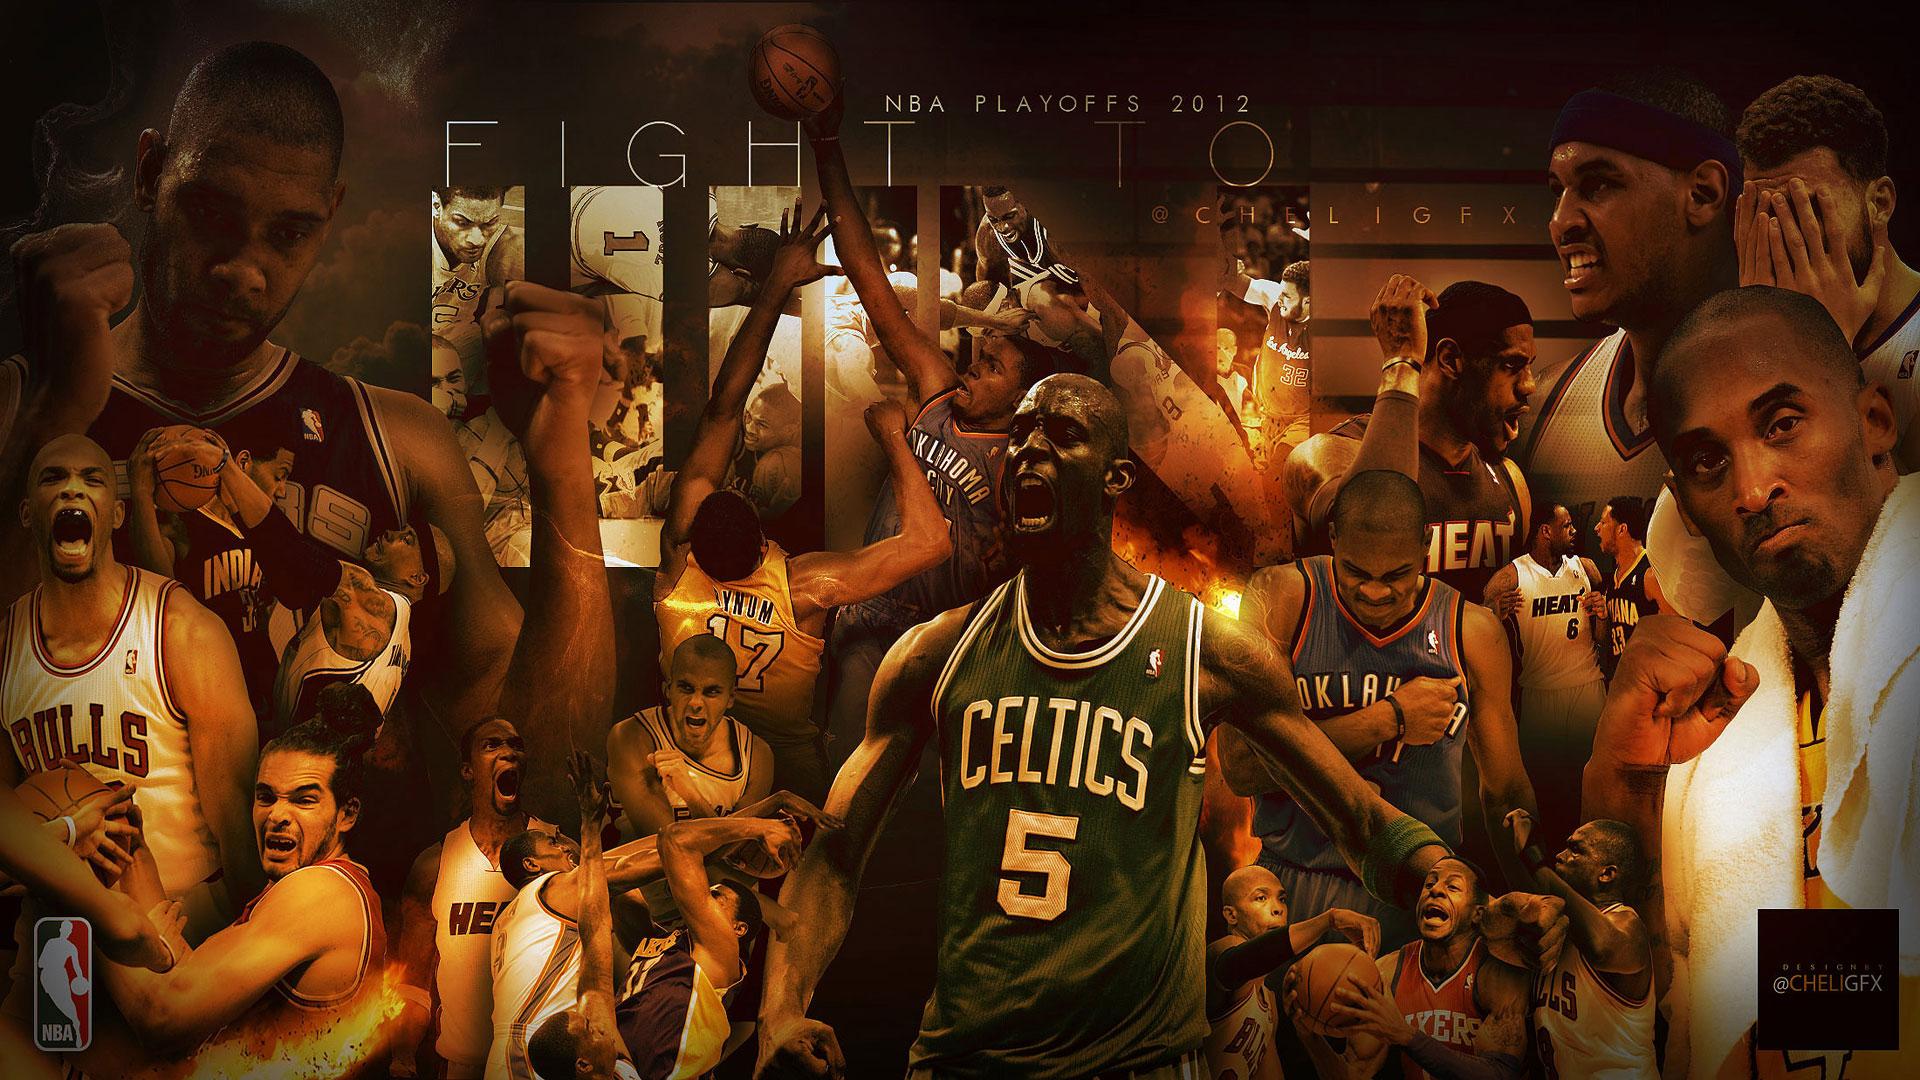 - 2012-NBA-Playoffs-Fight-To-Win-Wallpaper-BasketWallpapers.com-